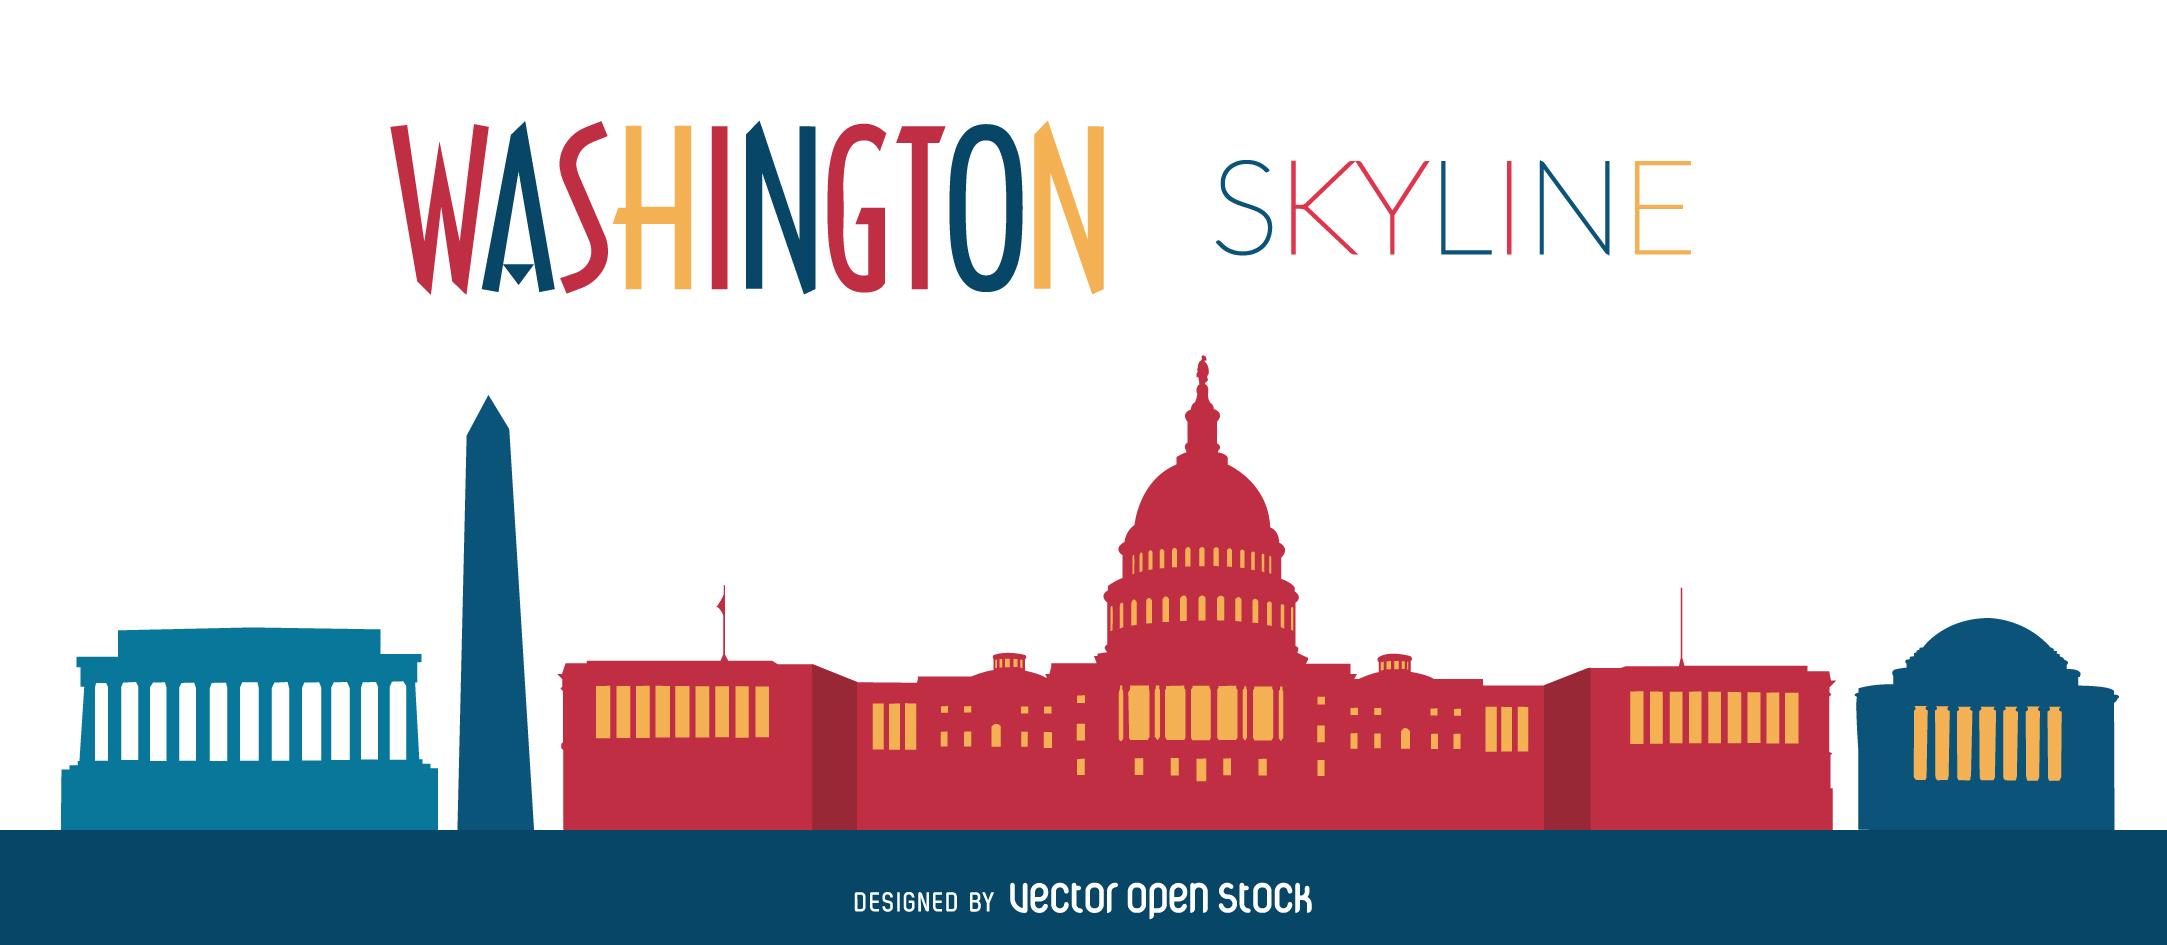 Washington skyline illustration - Vector download